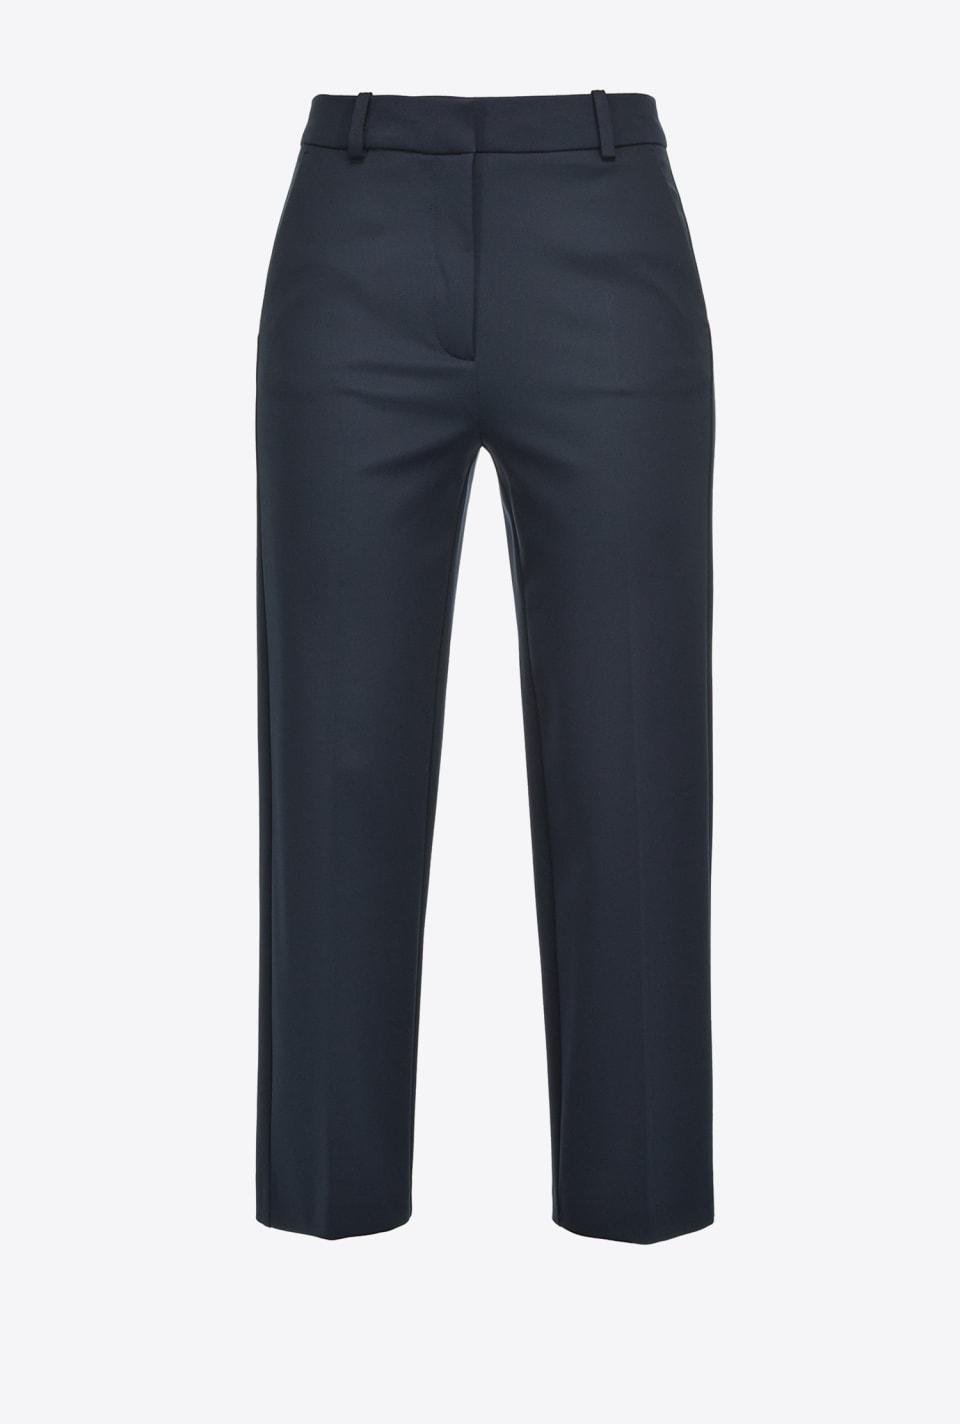 Pantalon aspect scuba - Pinko